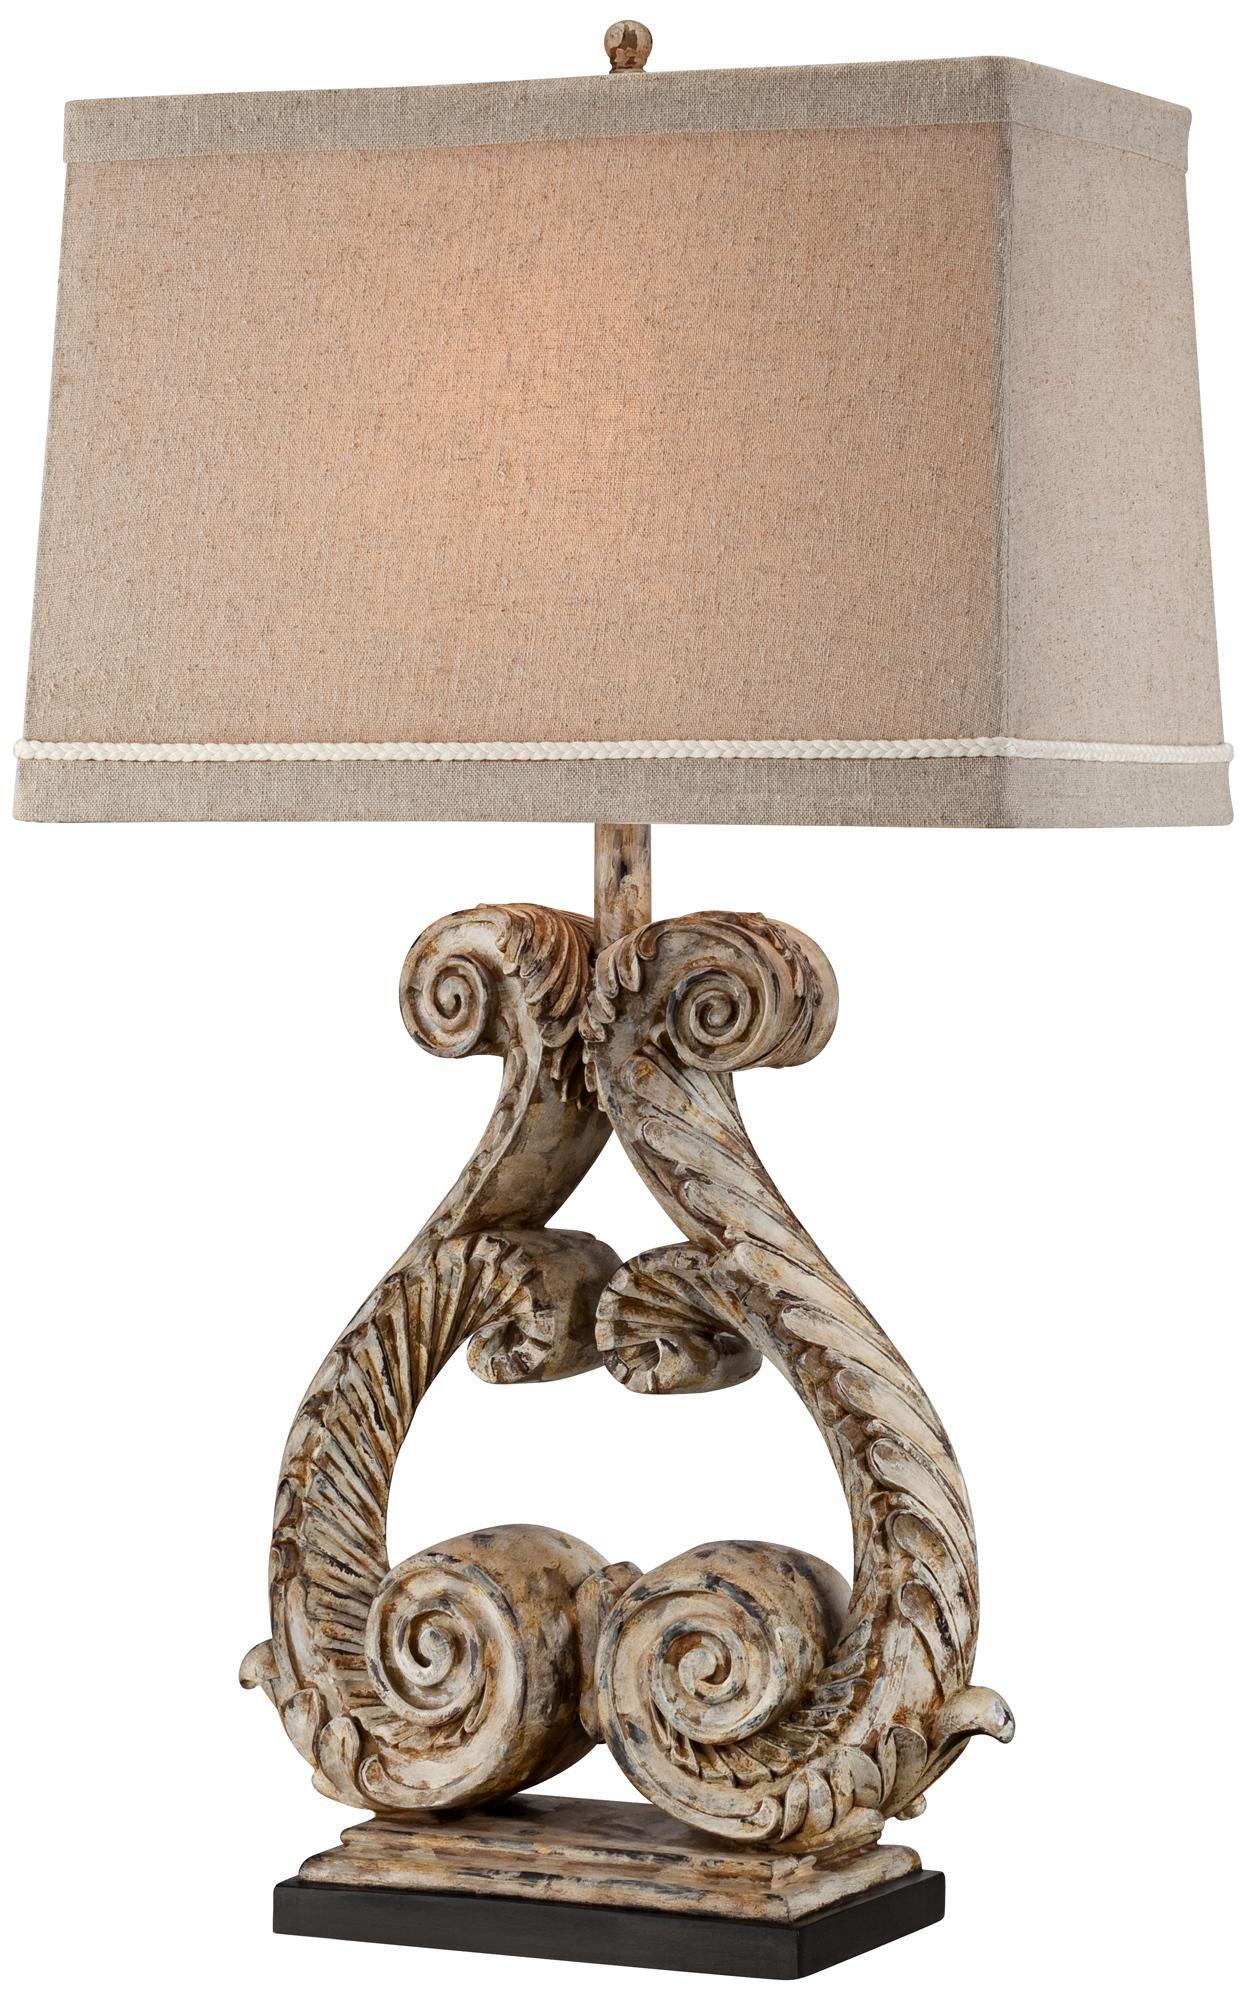 Possini Harp Weathered Double Scroll Table Lamp | LampsPlus.com